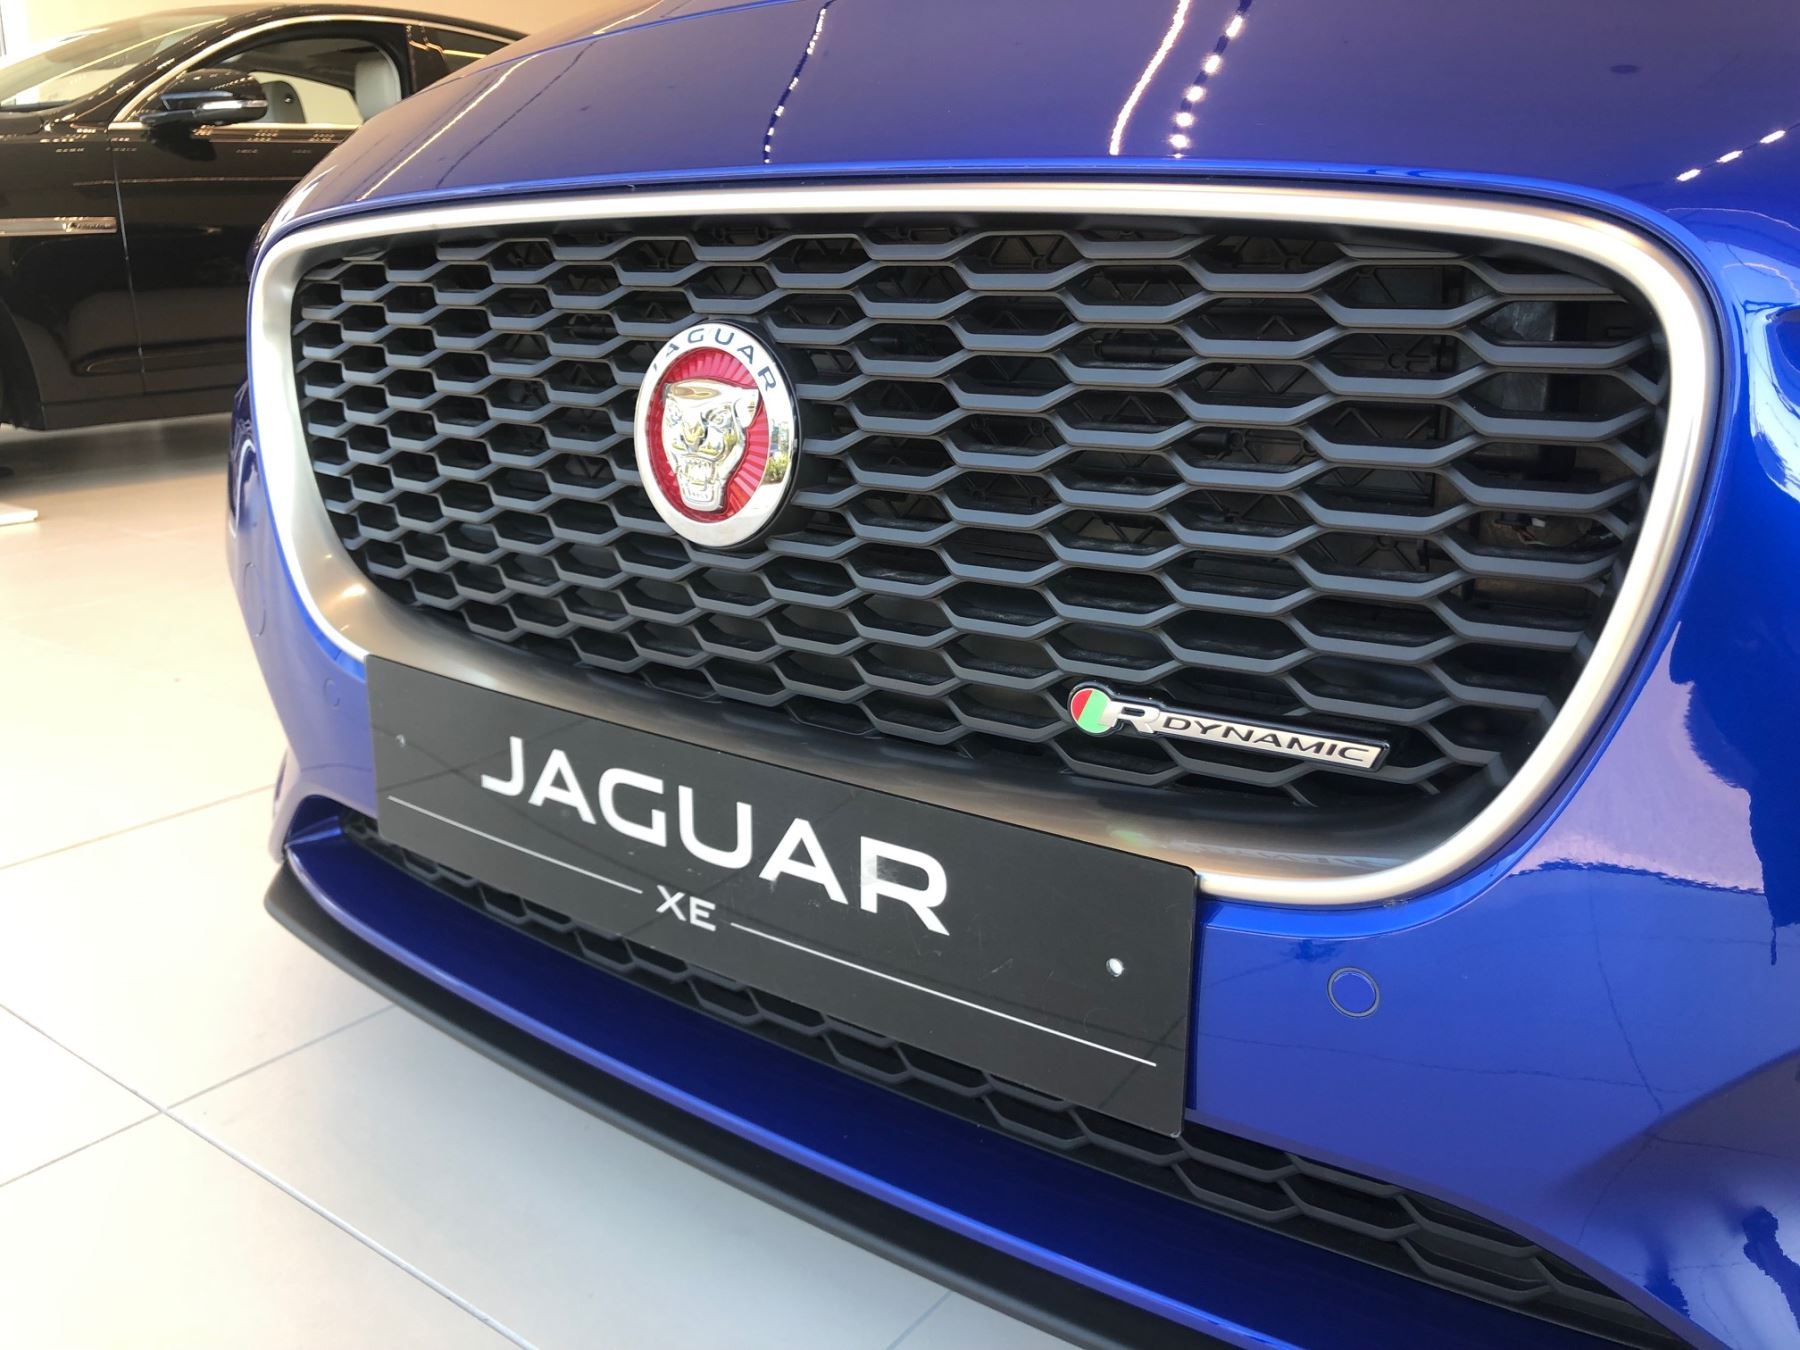 Jaguar XE 2.0 R-Dynamic SE image 9